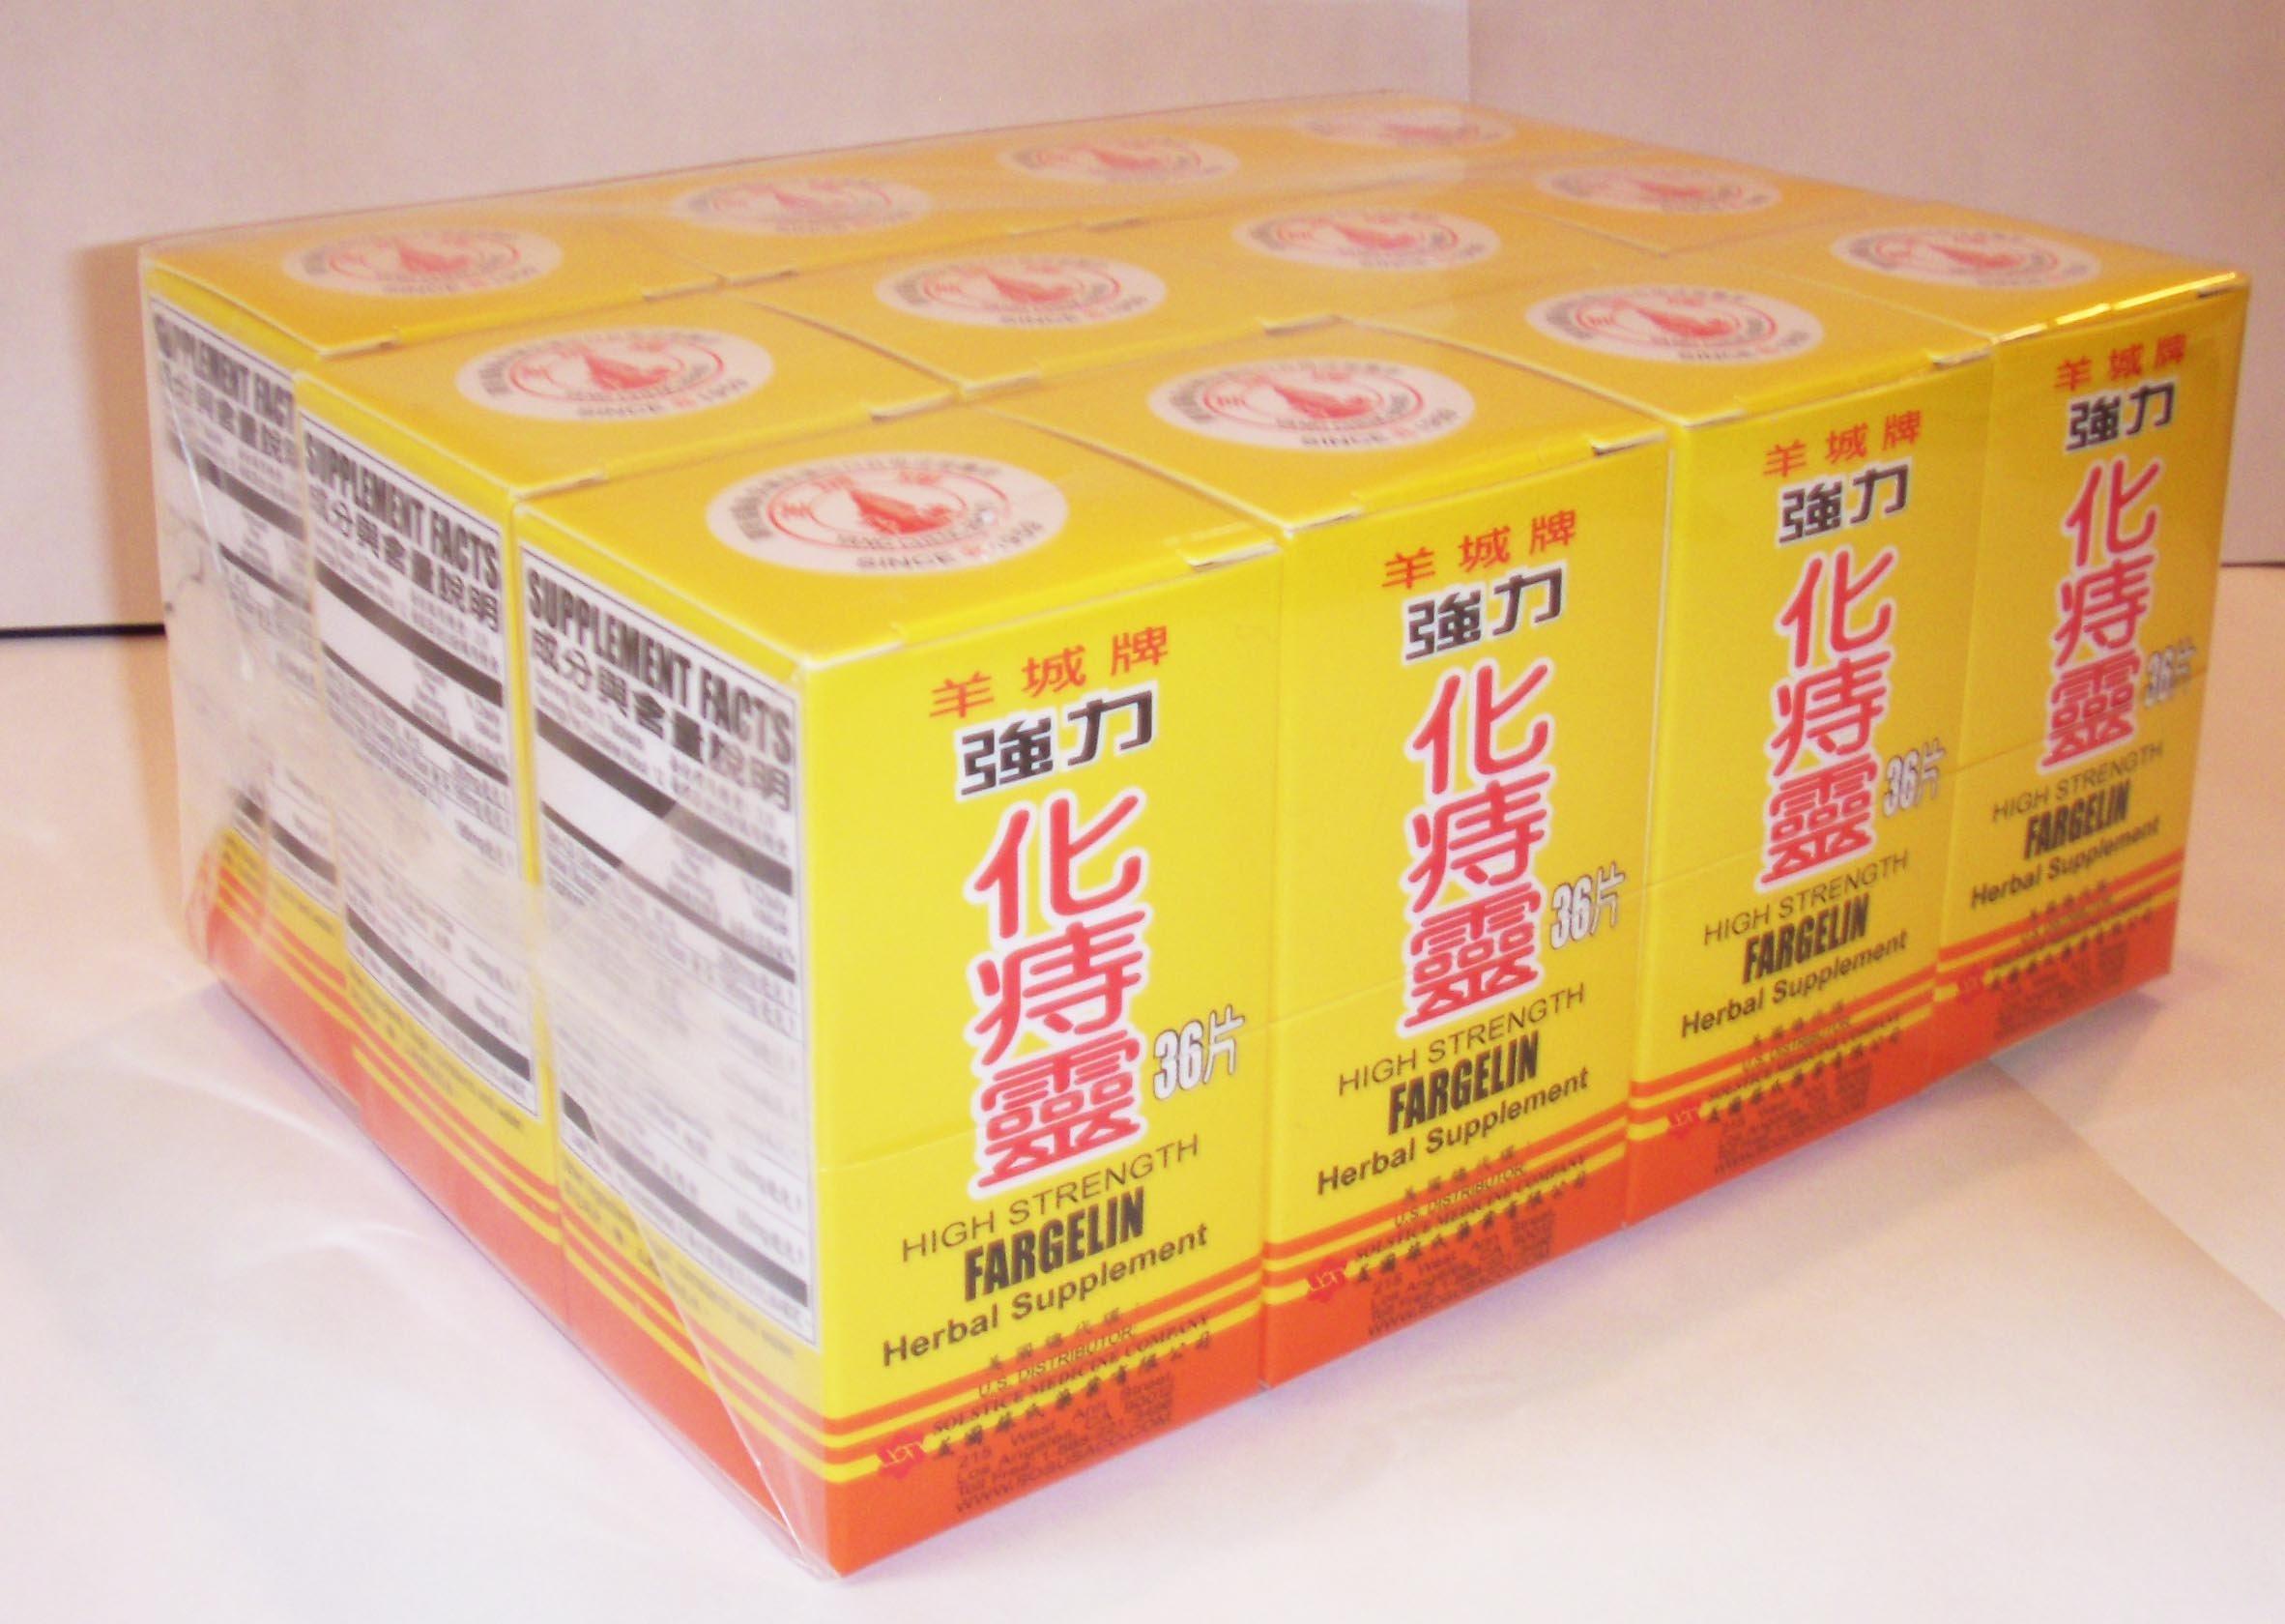 High Strength Fargelin 36 Tablets Per Bottle - 12